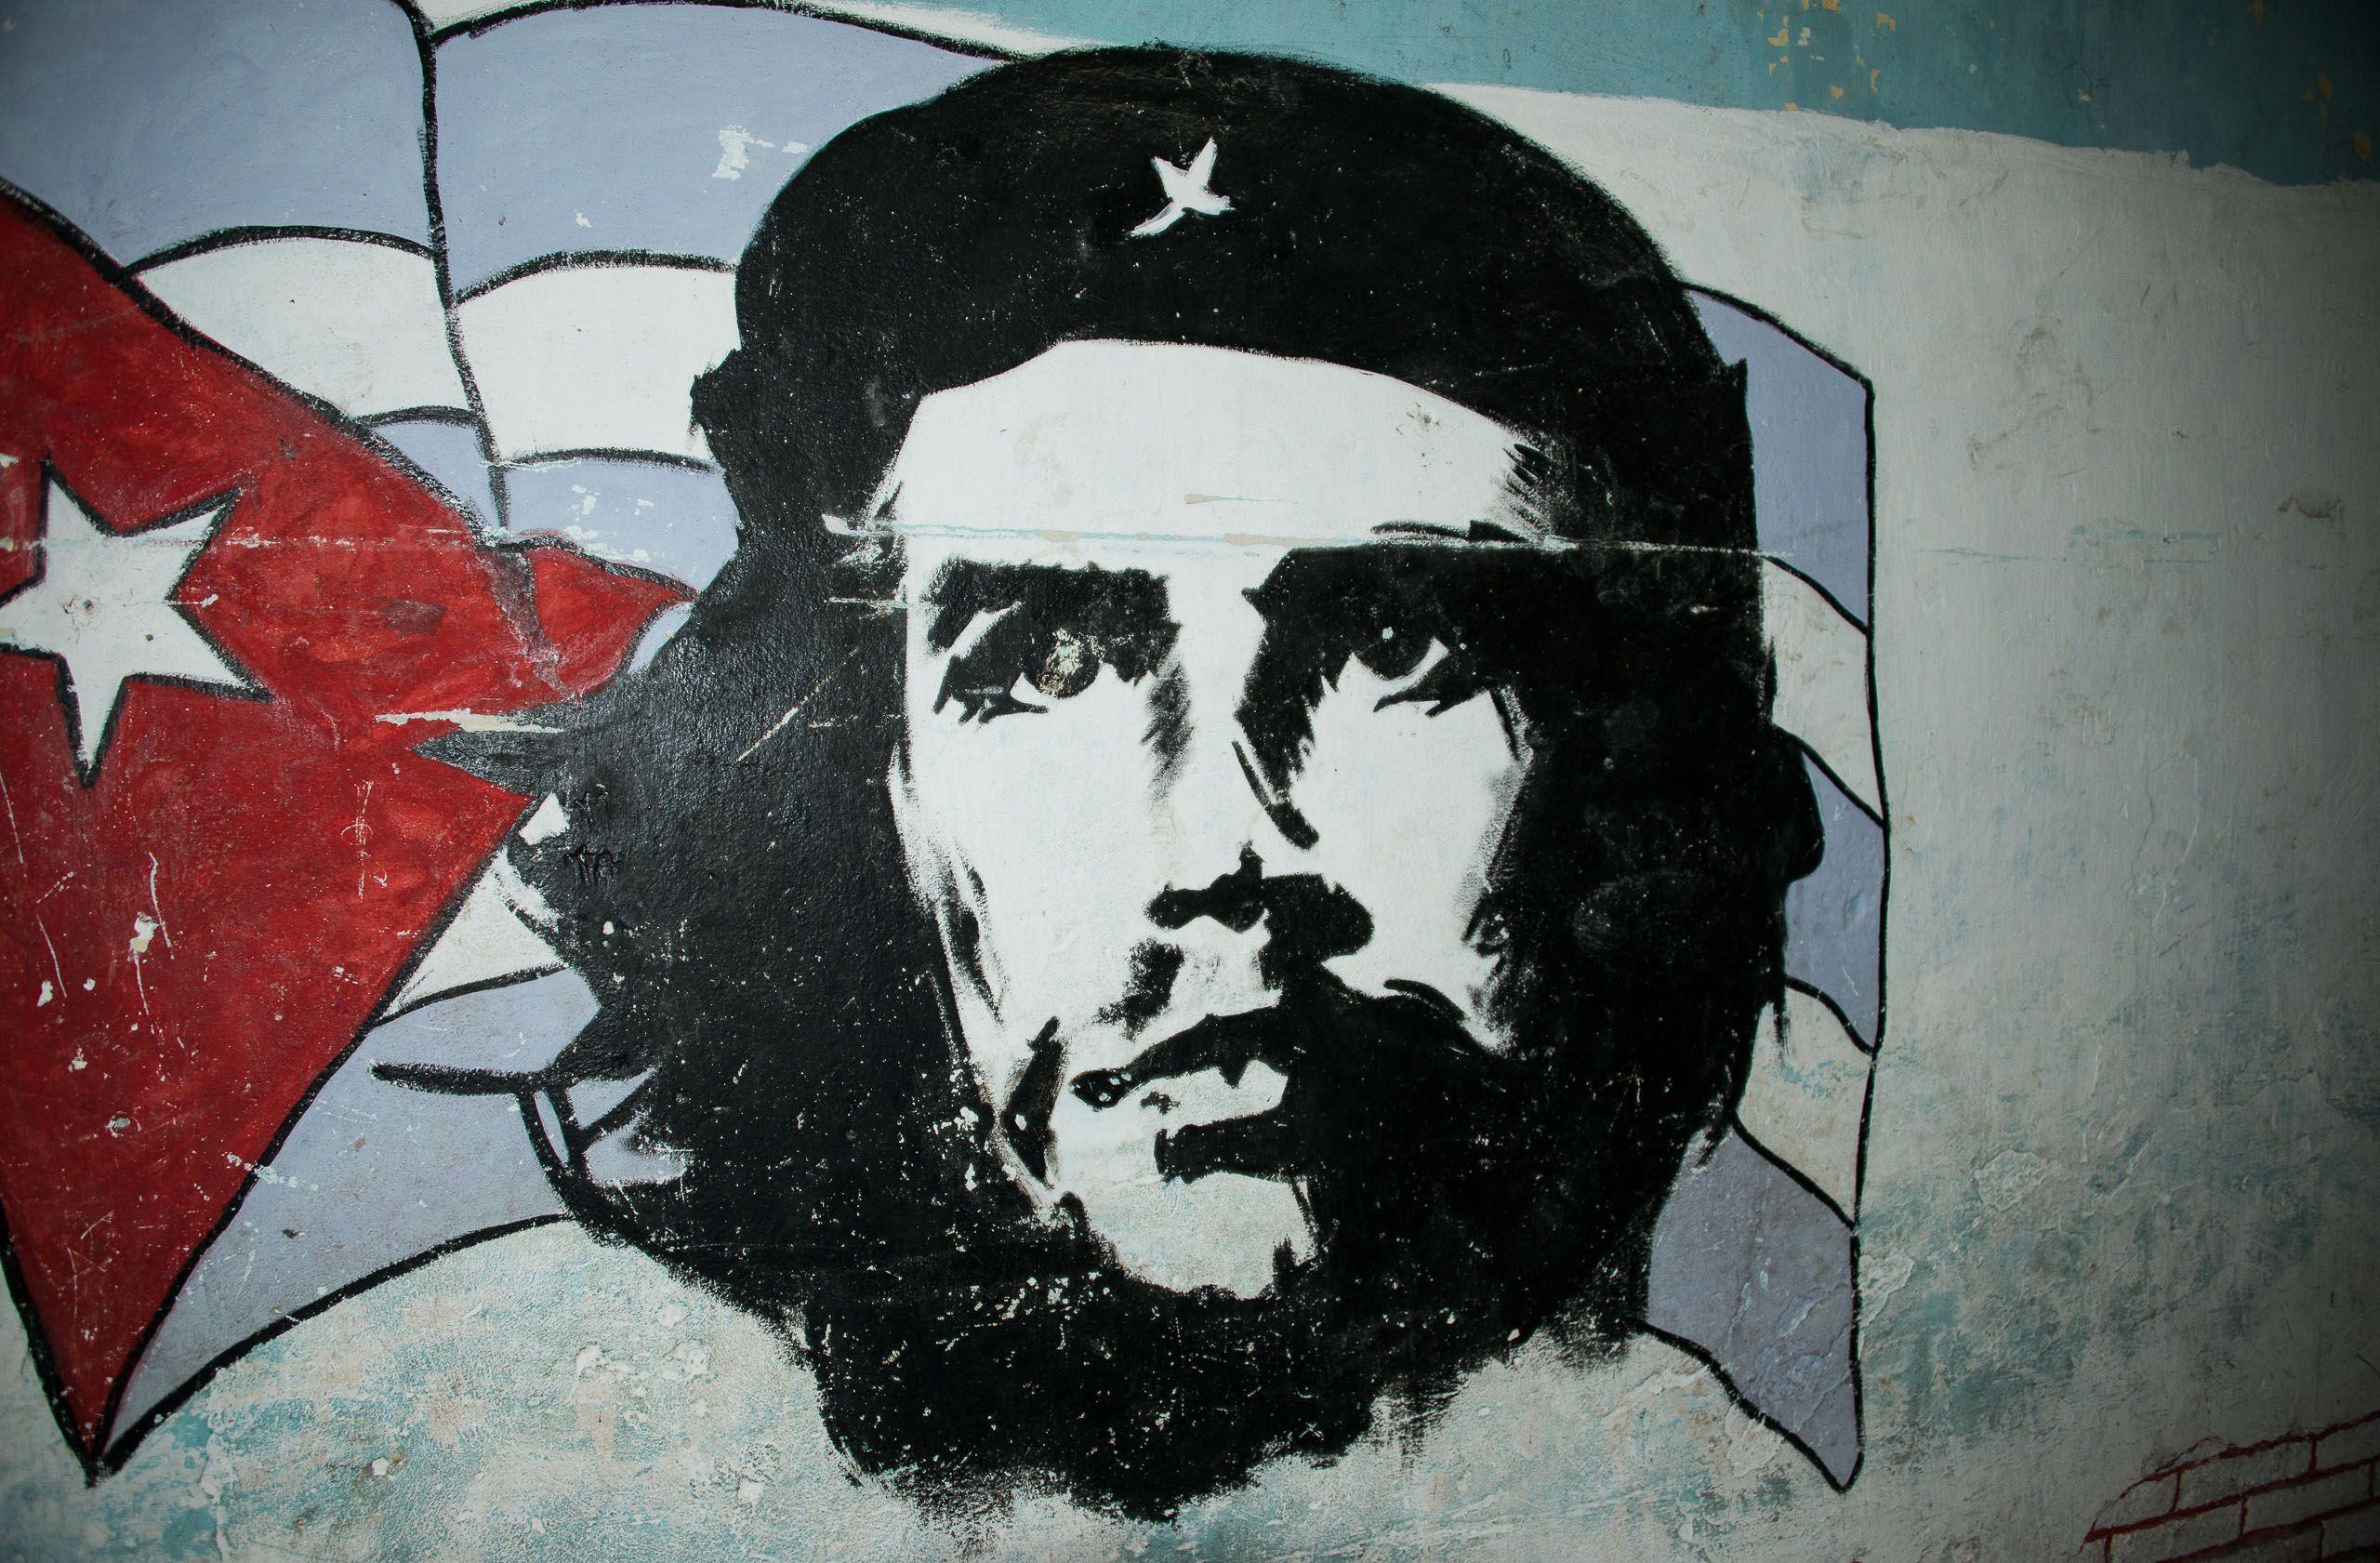 Che Guevara street mural, Havana, Cuba